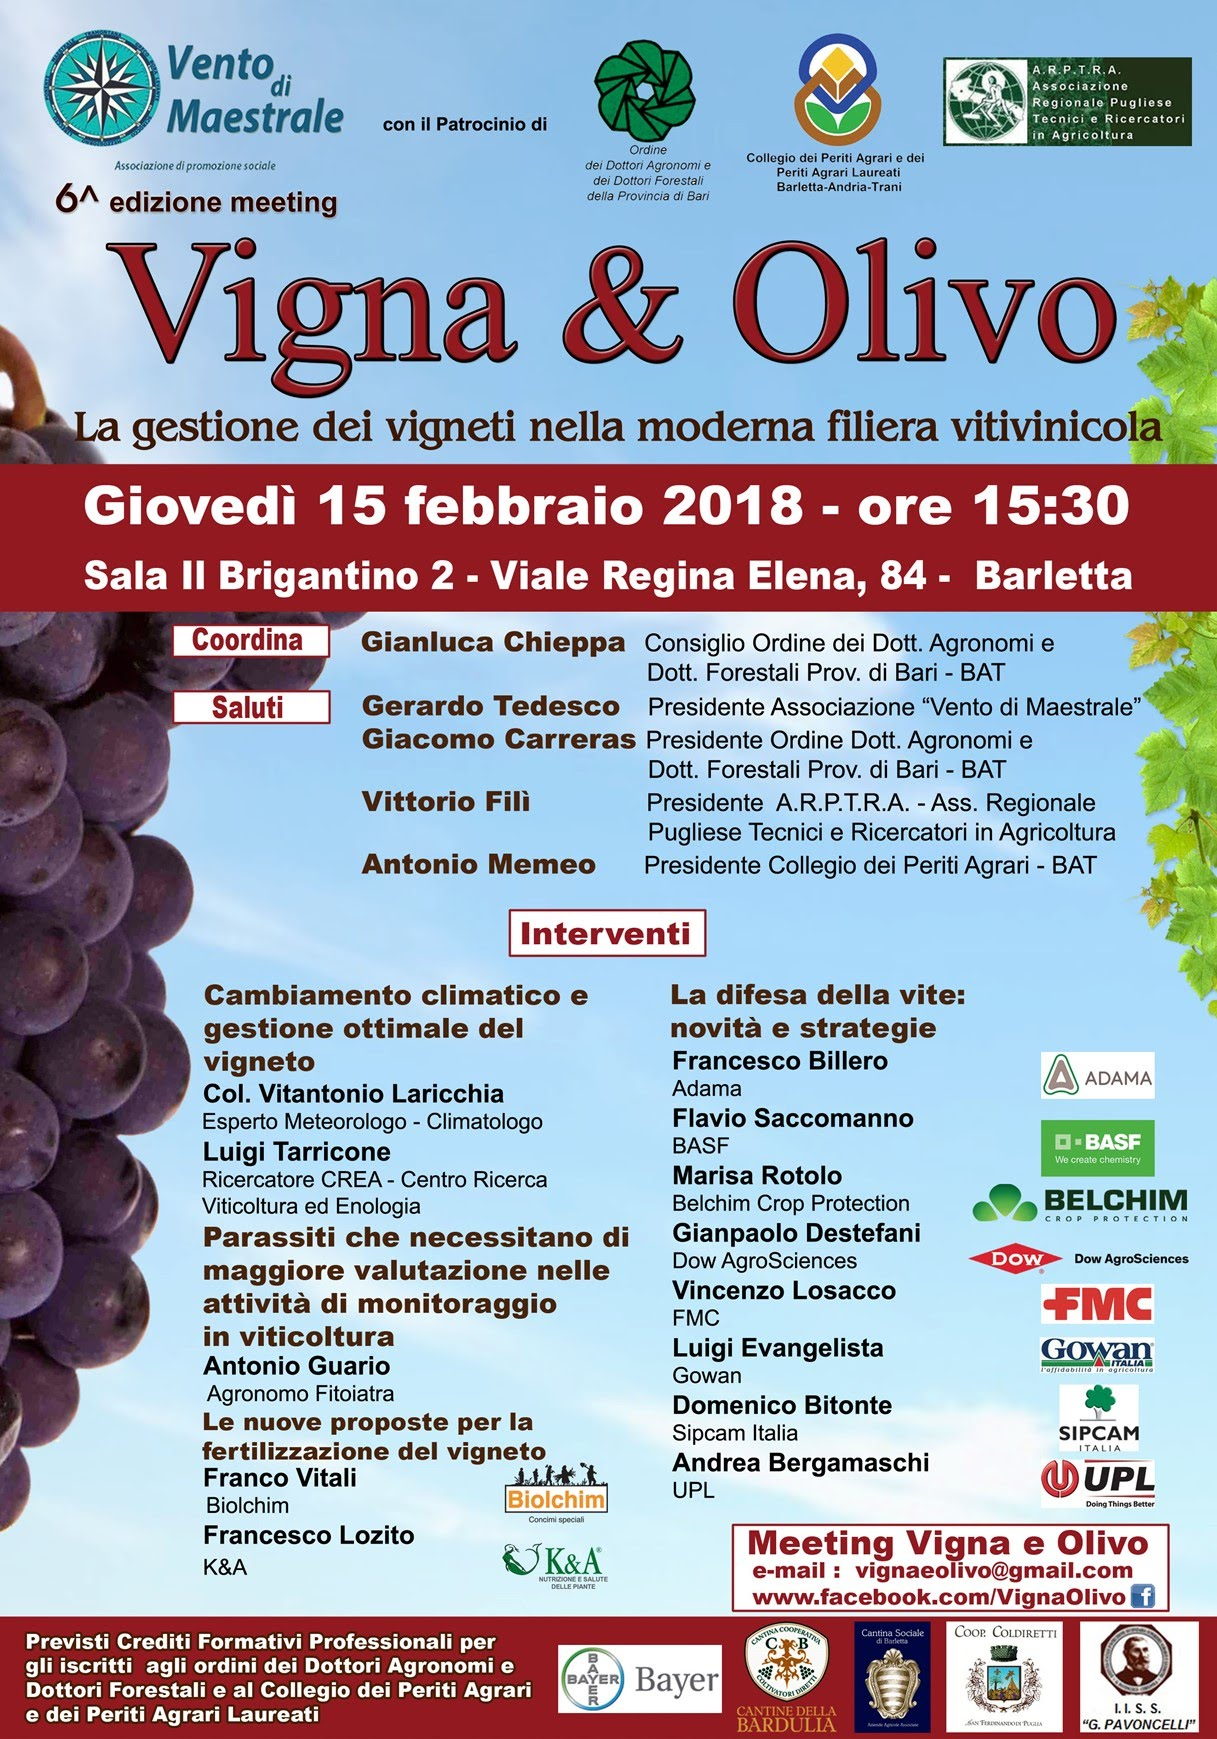 Vigna & Olivo